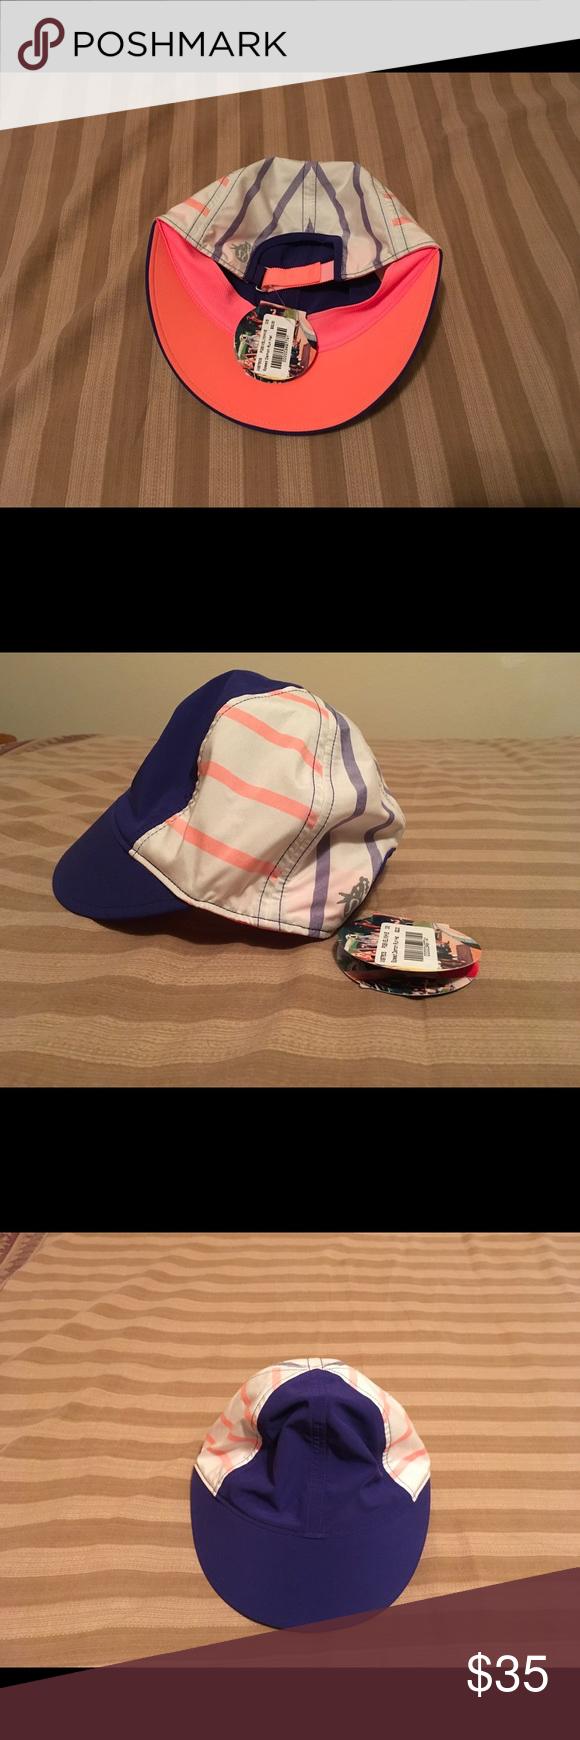 2e7124e6e6e NWT Lululemon Seawheeze Hat New with tags Lululemon Speed Demon Run Hat  from Lulu s 2015 Seawheeze